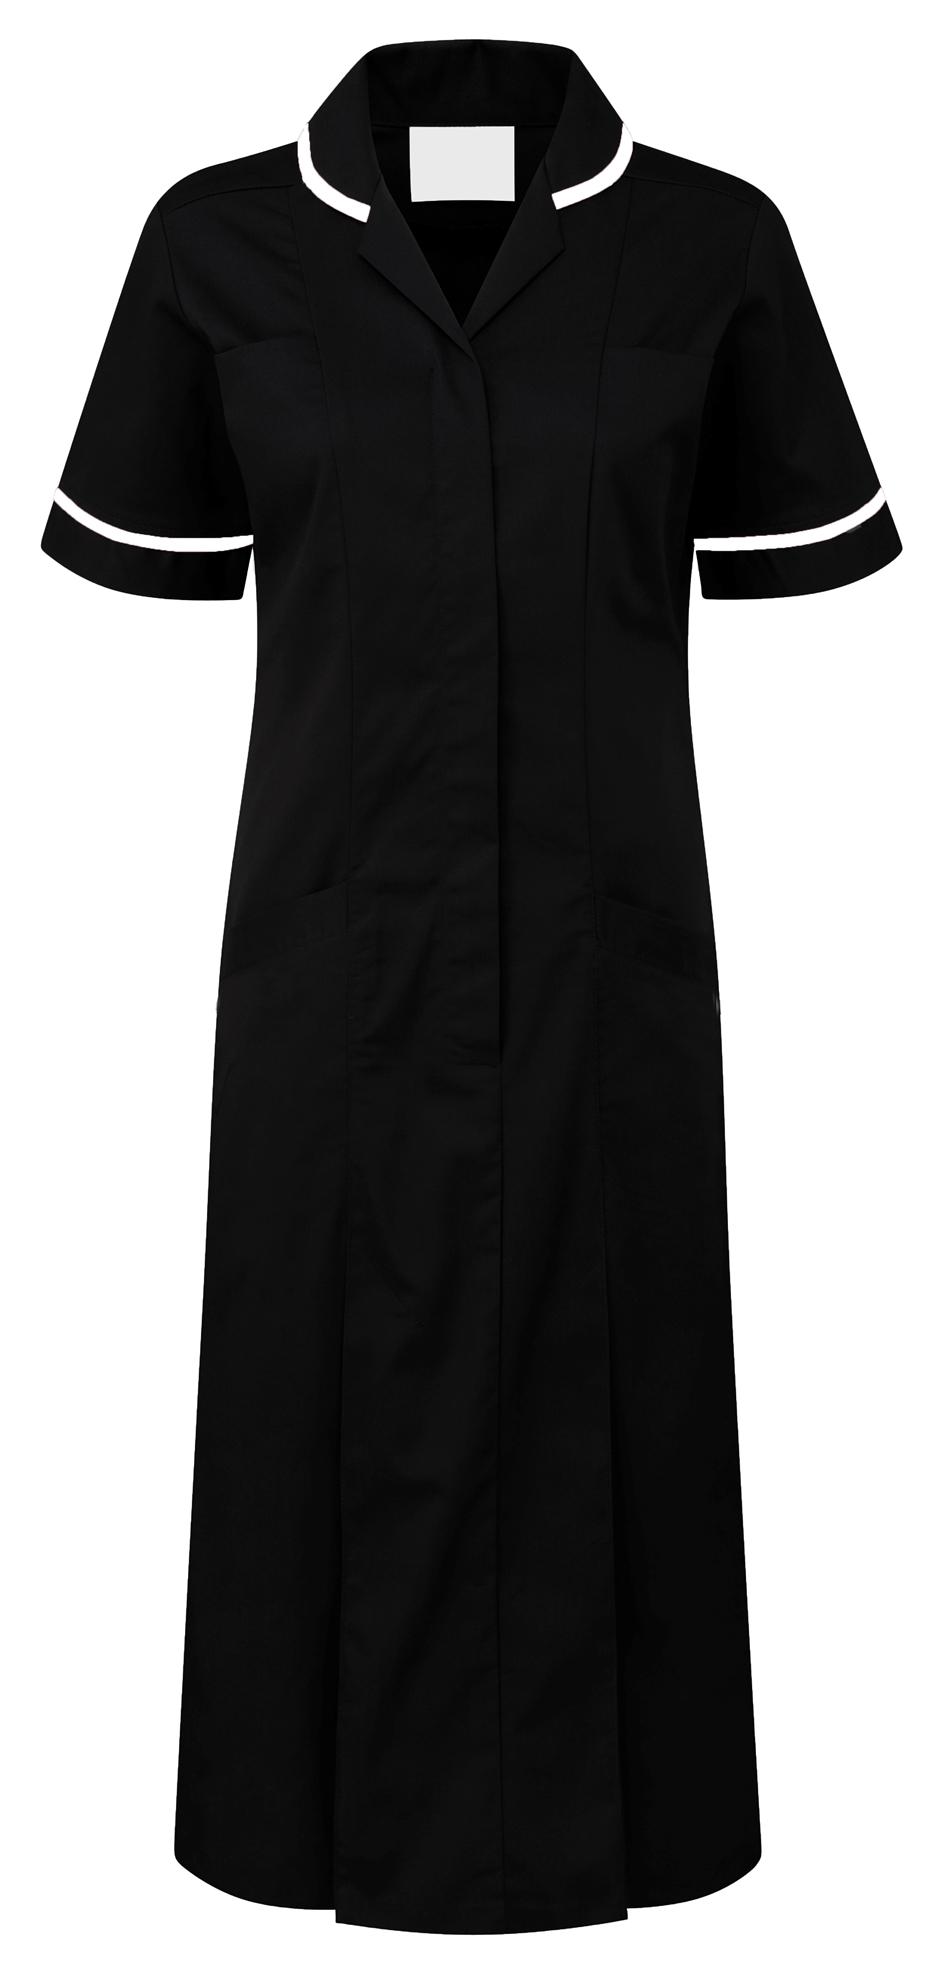 Picture of Plain Colour Dress - Black/White